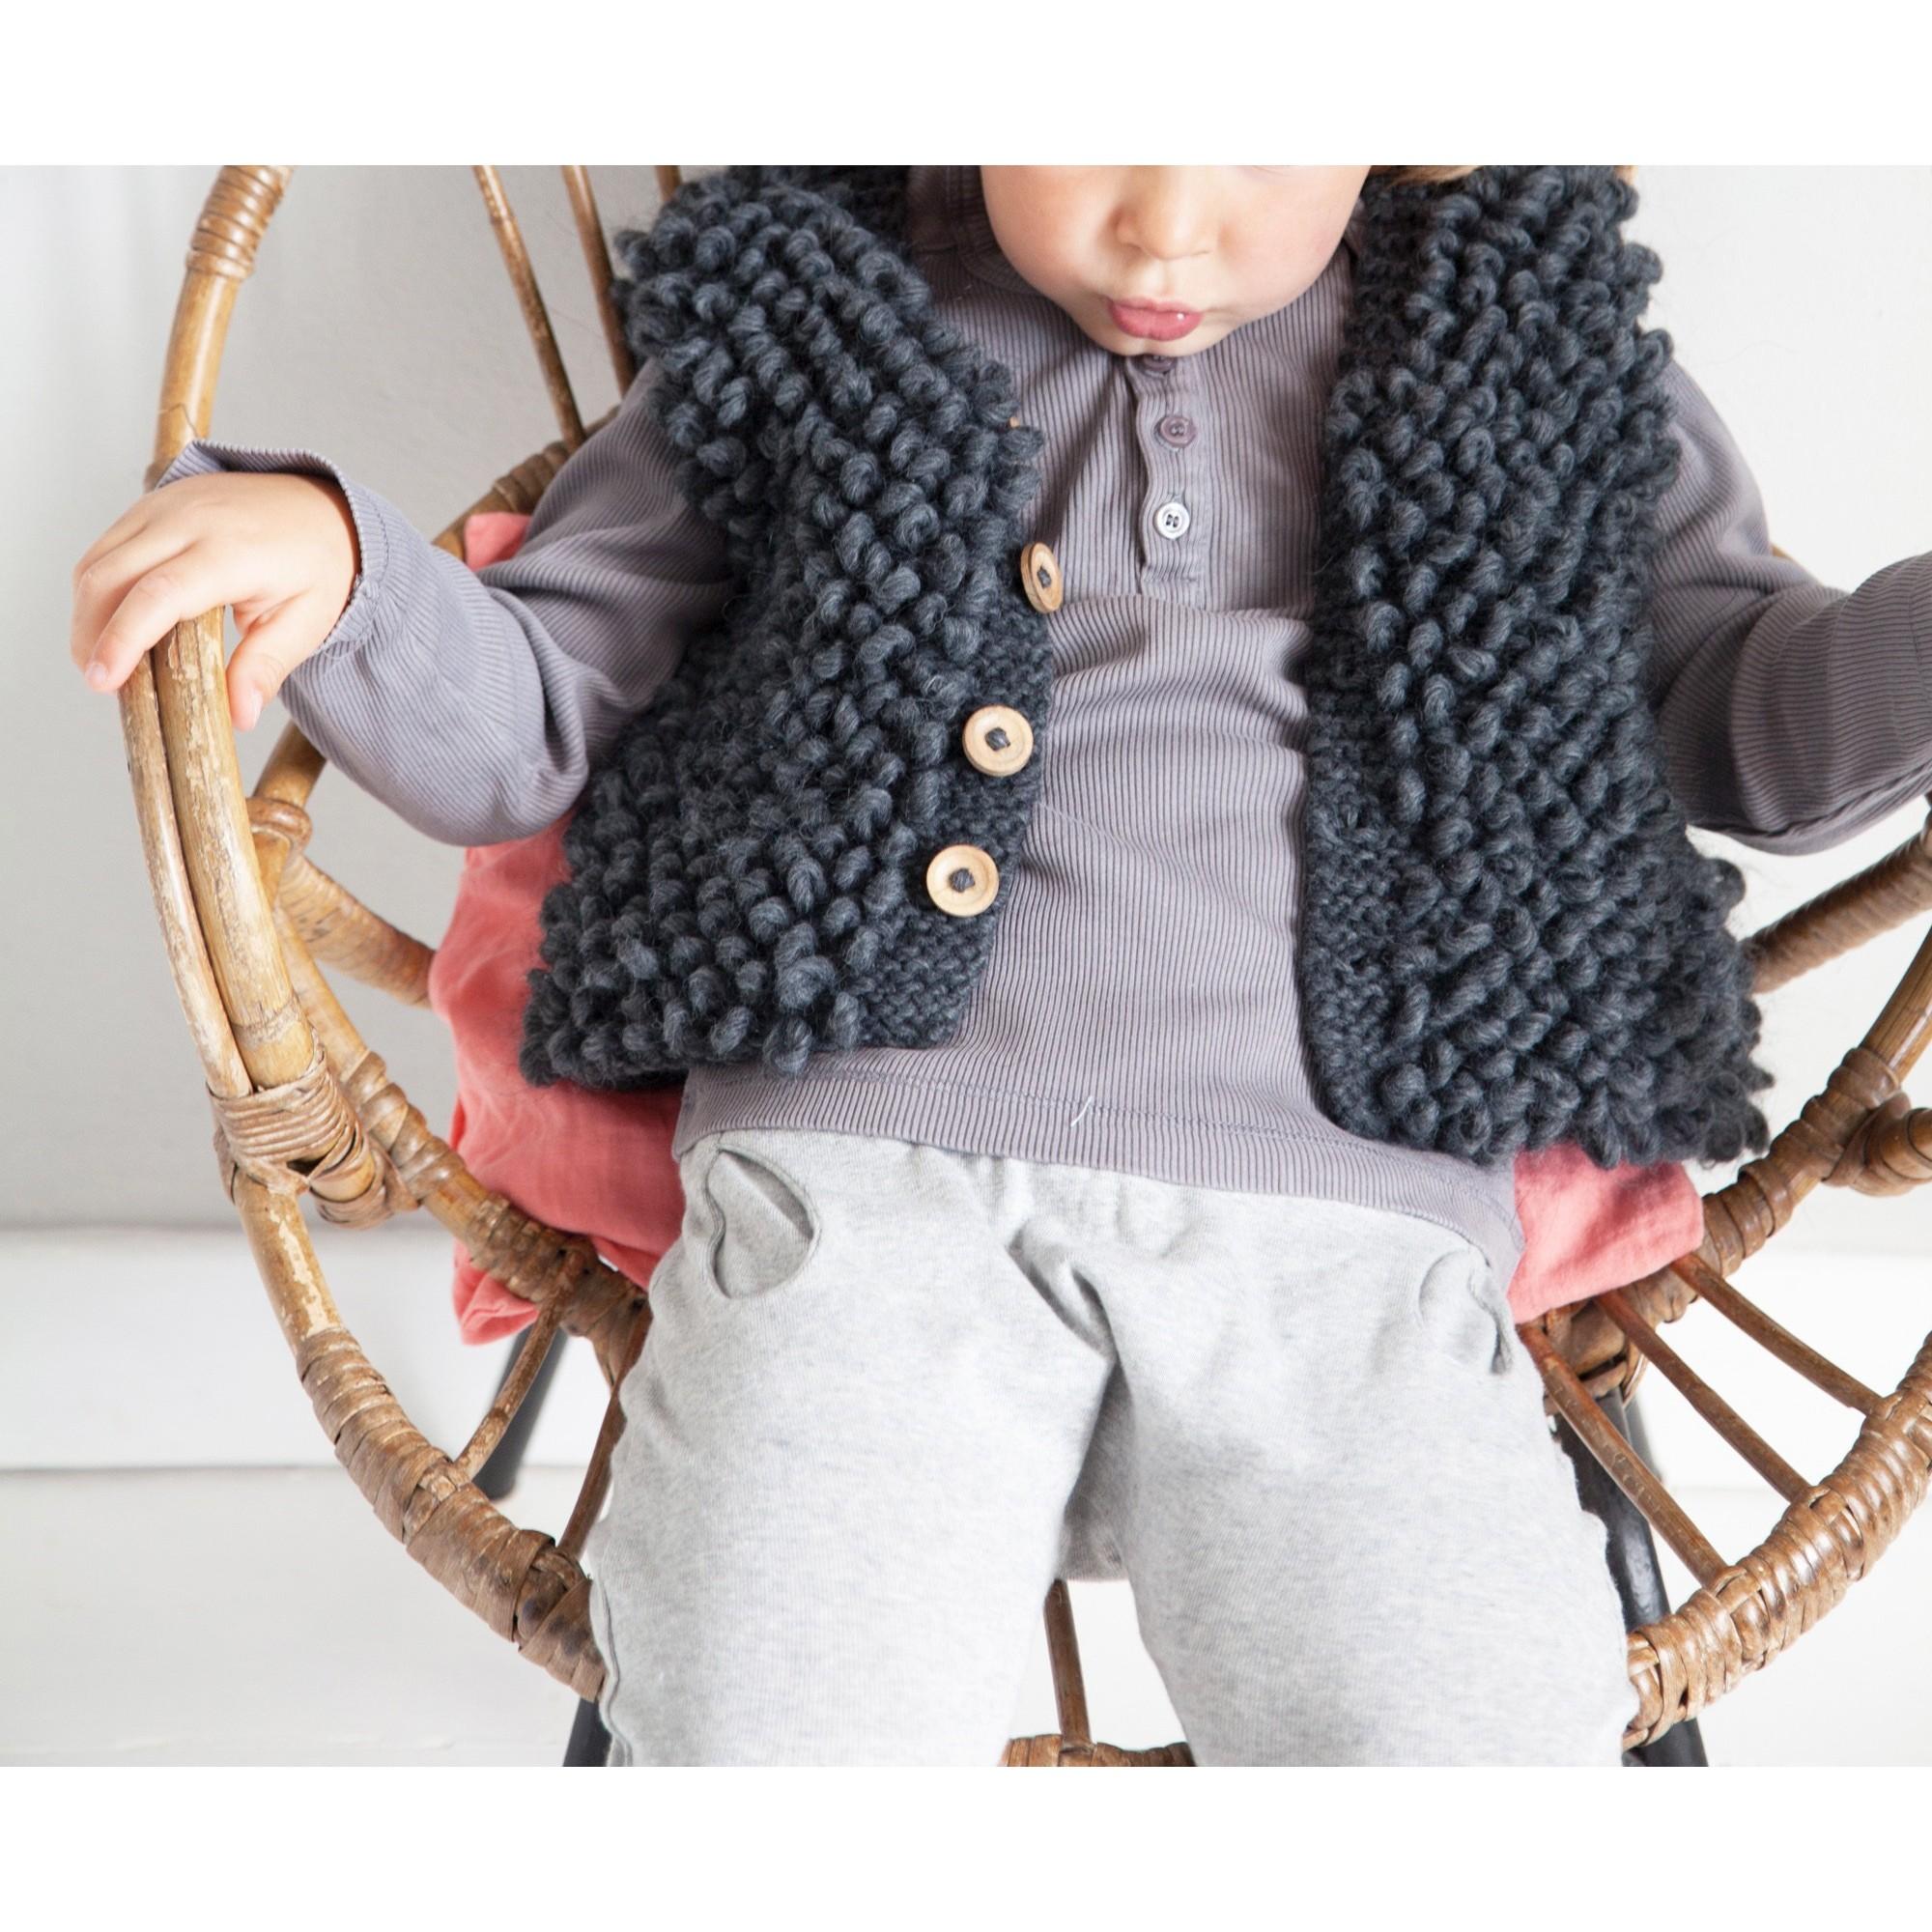 Gilet de berger Philibert style berger laine alpaga porté